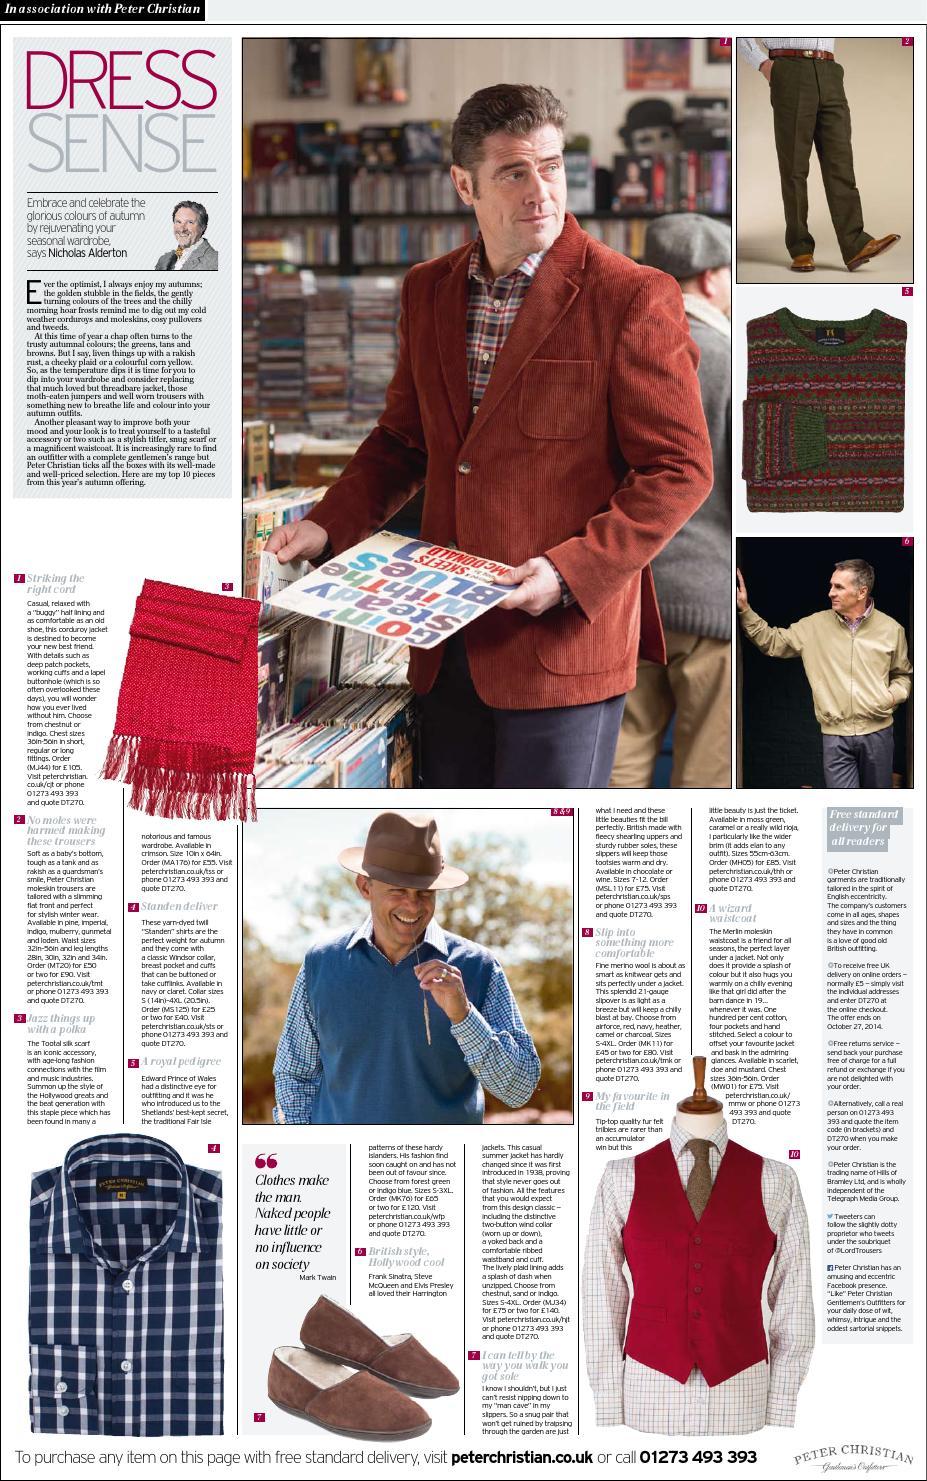 901dad04c9ffd9 Peter Christian Daily Telegraph Dress Sense by Peter Christian - issuu